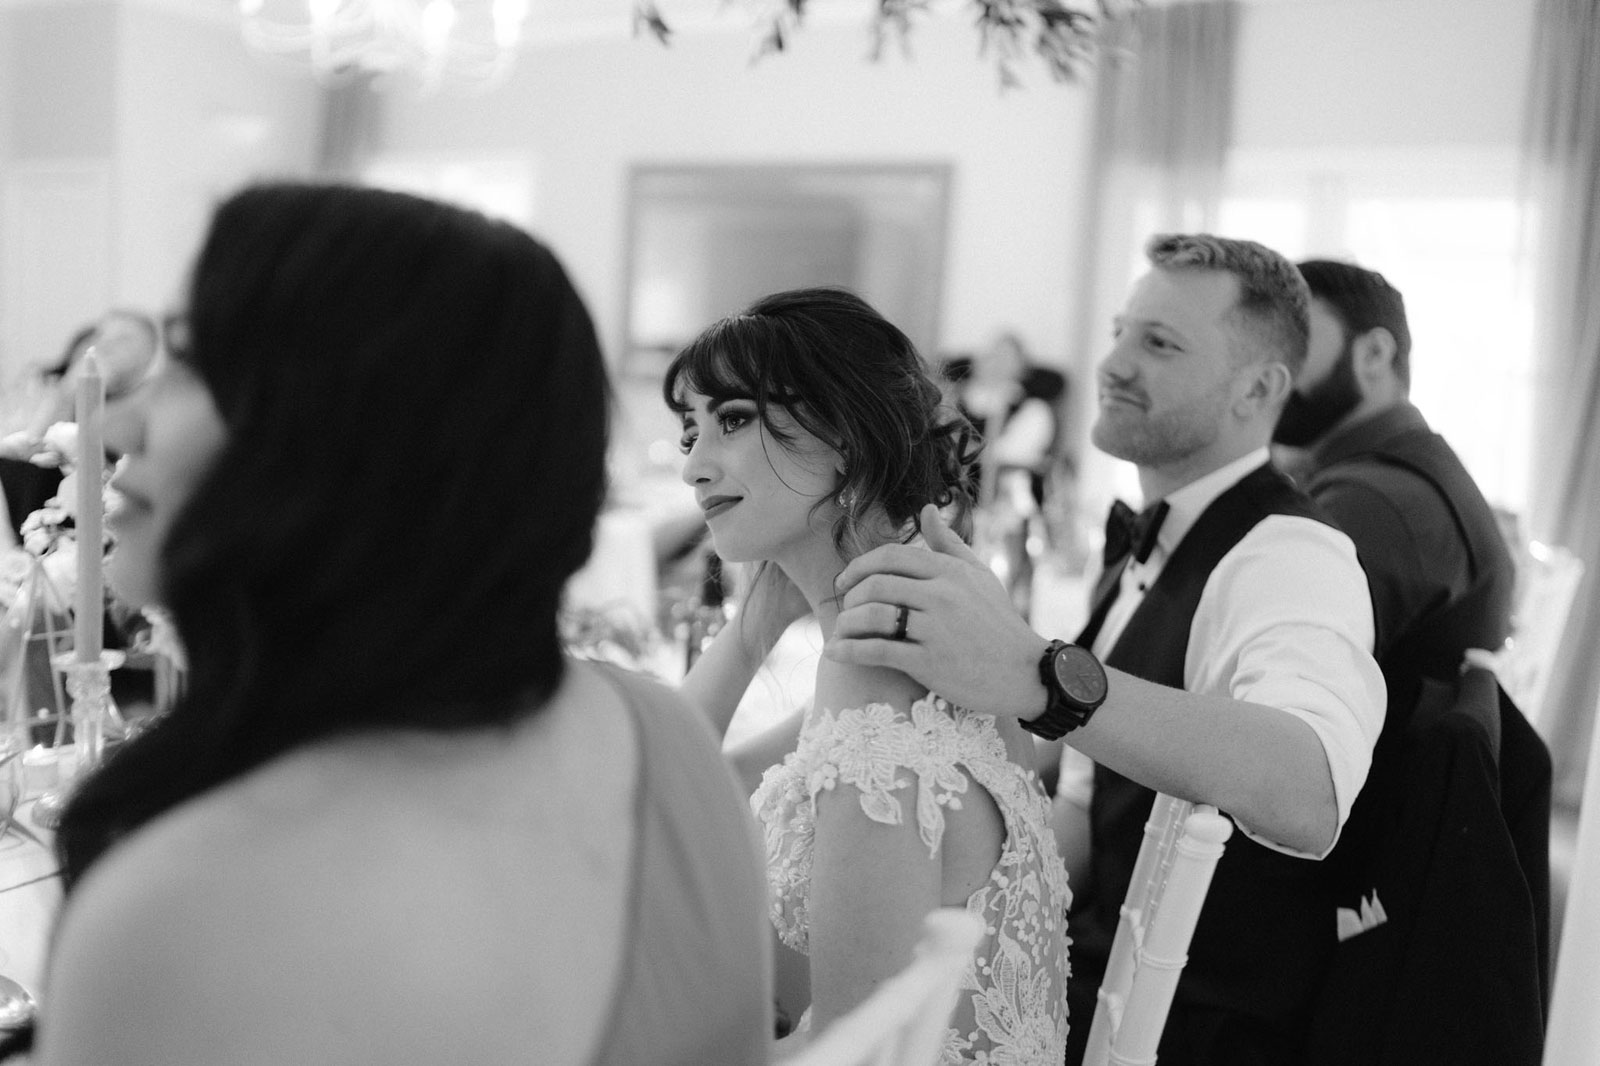 newfound-n-c-olive-tree-cottage-tauranga-wedding-photographer-1020A